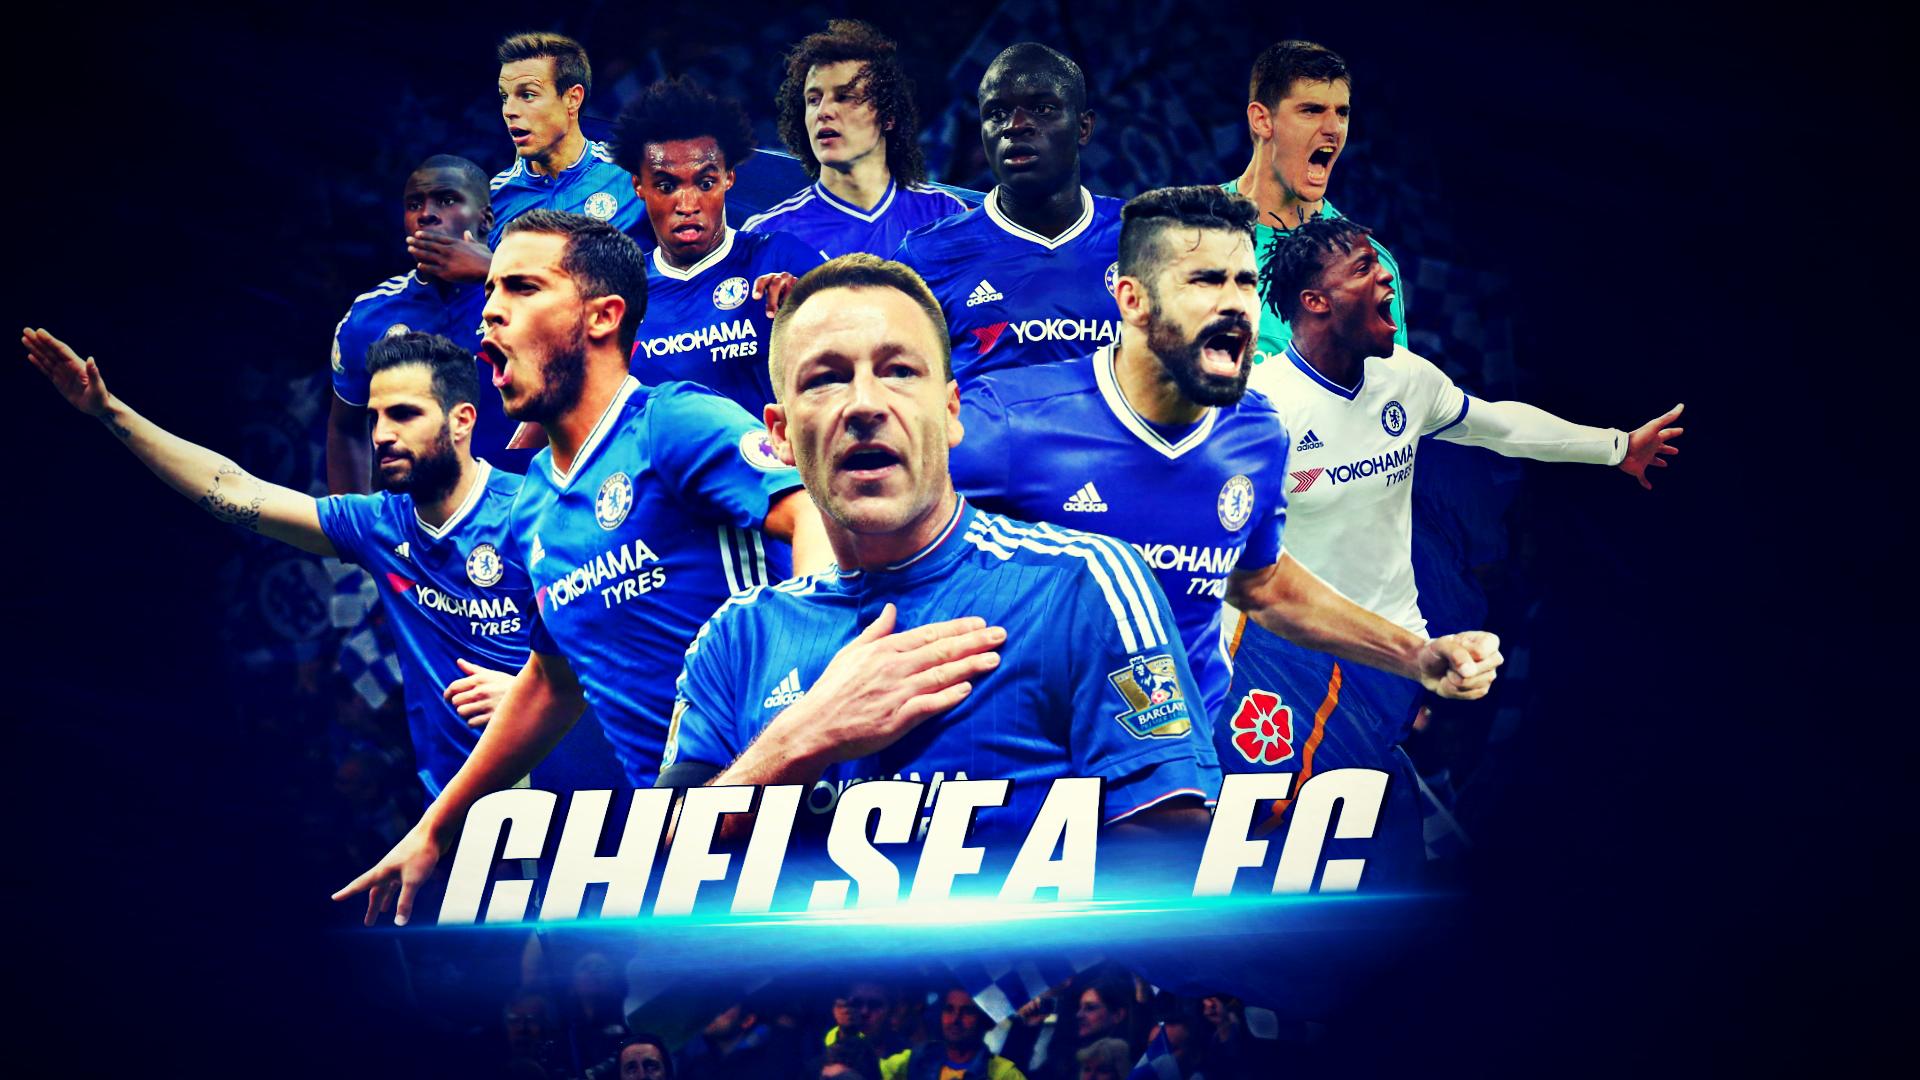 Chelsea 16/17 Wallpaper by TDECFC on DeviantArt